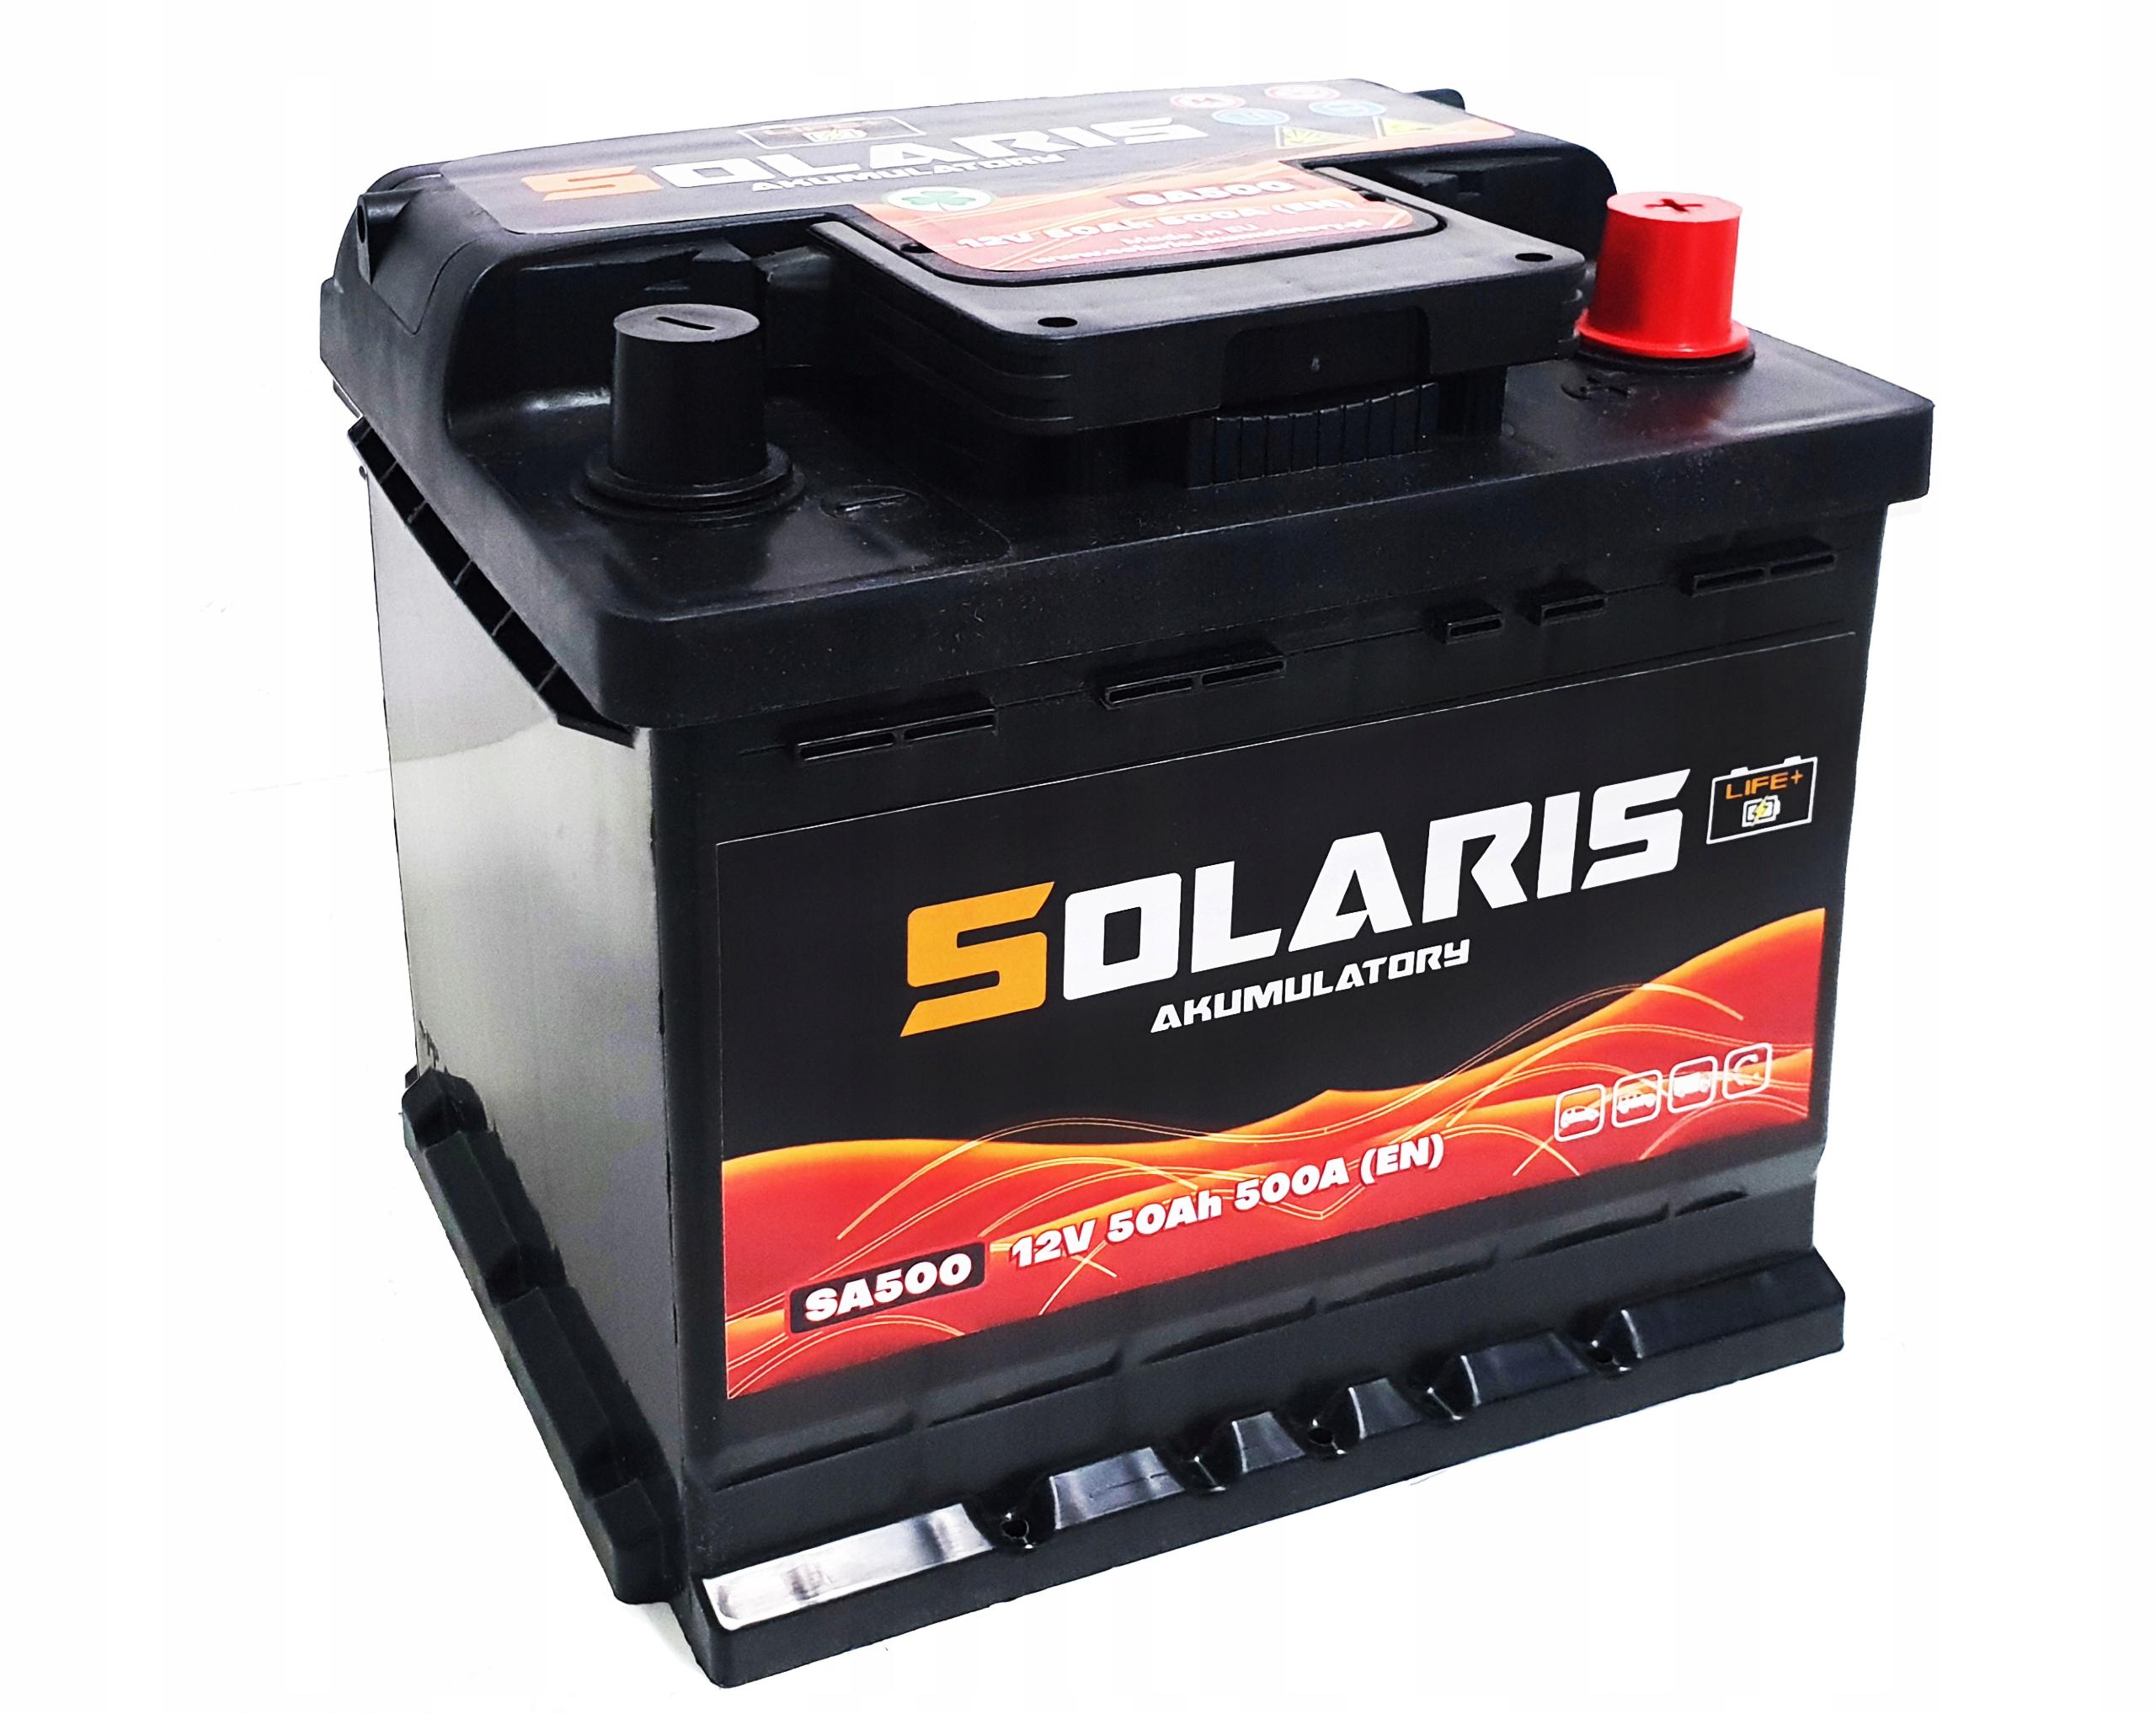 аккумулятор solaris 50ah 500a они 50 500